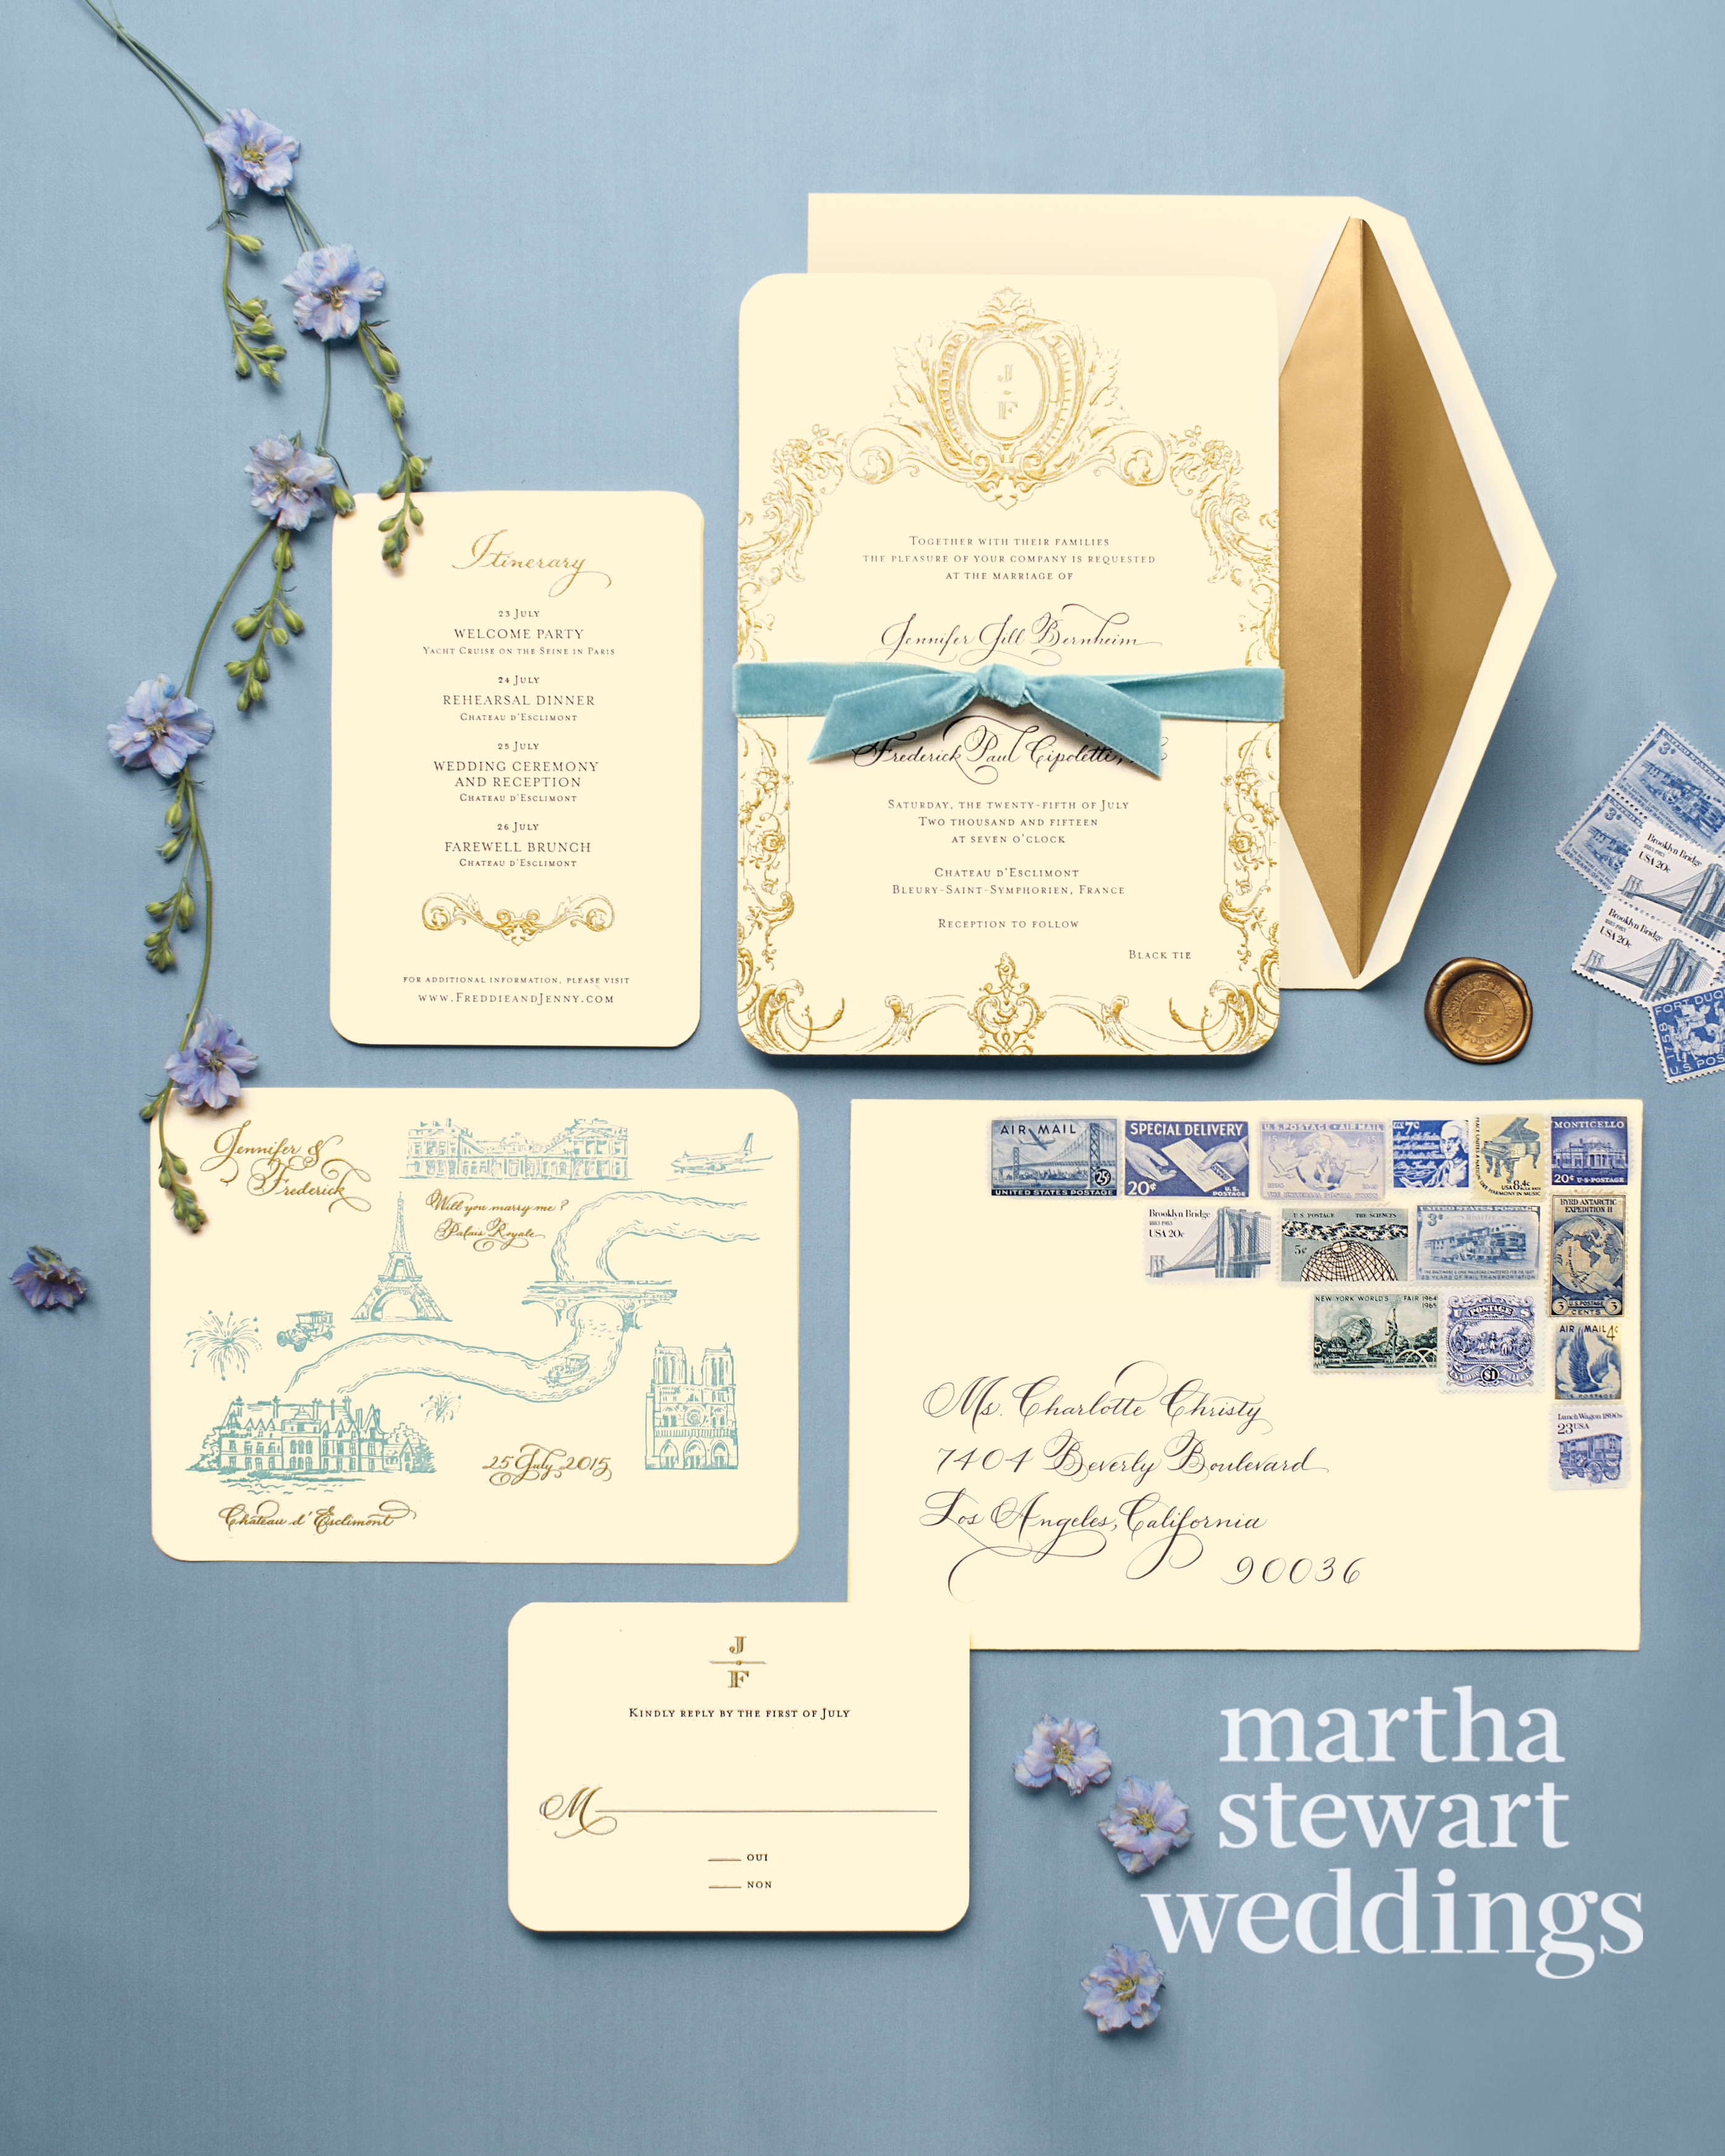 jenny-freddie-wedding-france-054-d112242-watermarked-1215.jpg